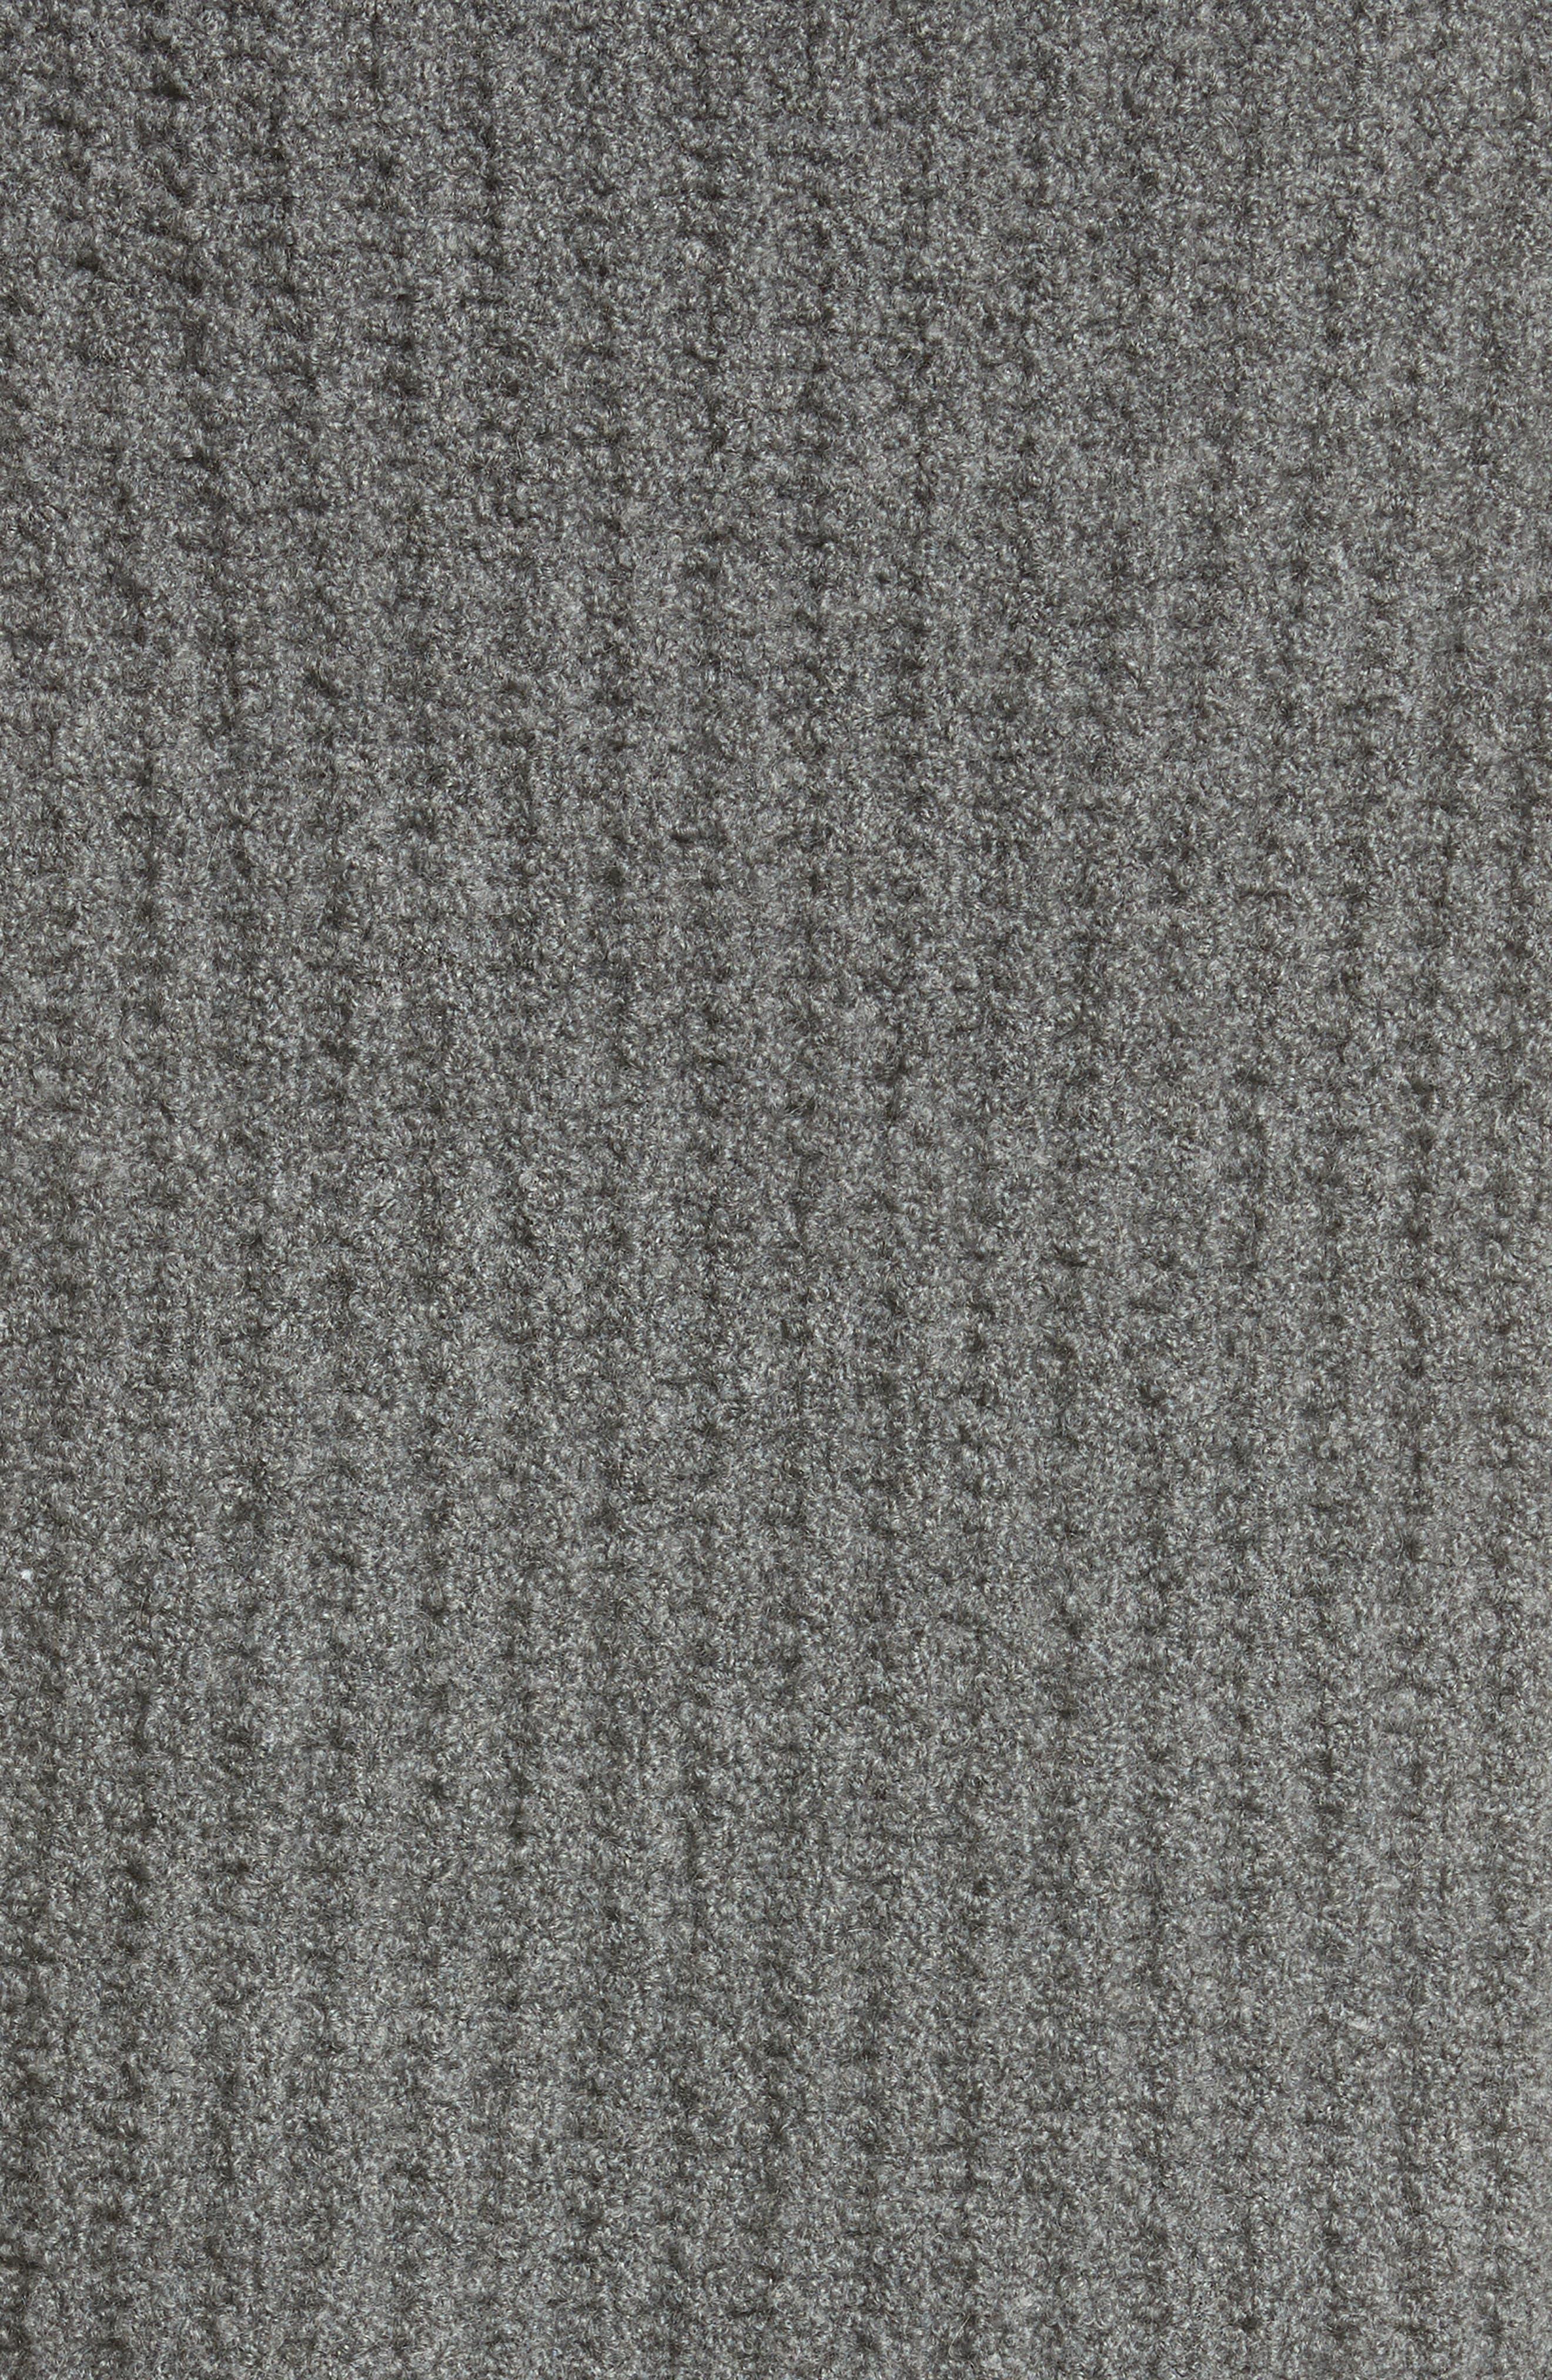 Sleeveless Cashmere Blend Turtleneck,                             Alternate thumbnail 5, color,                             021